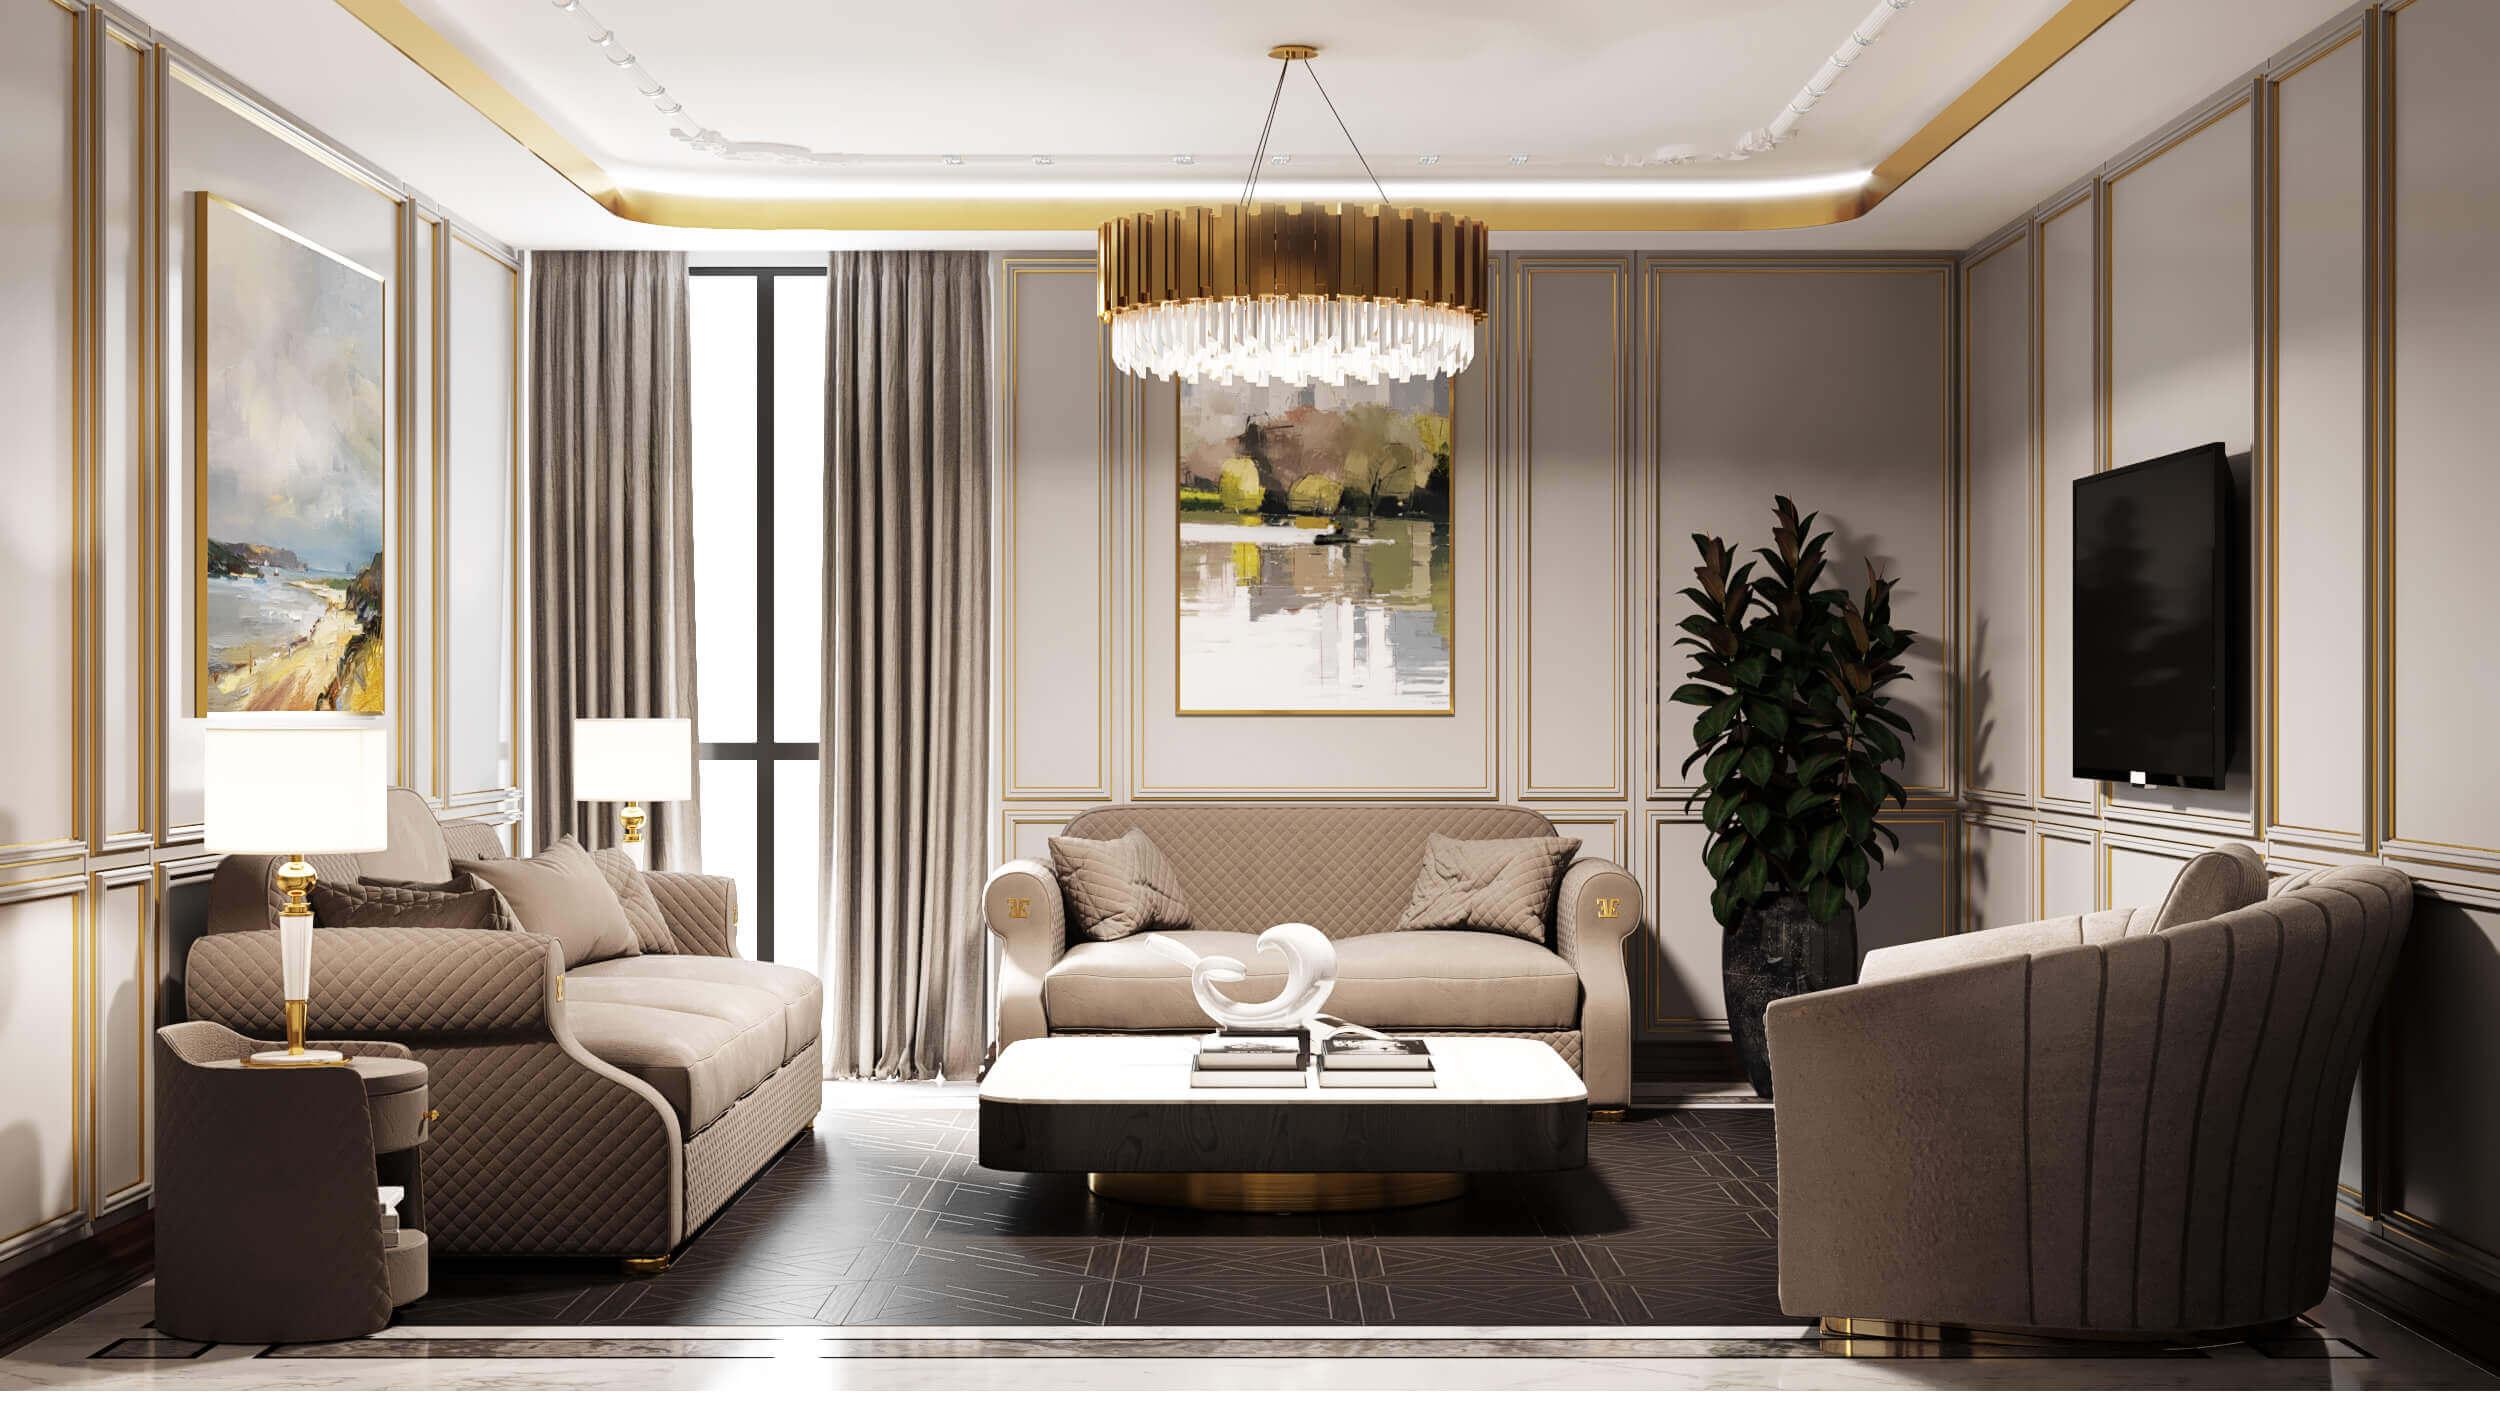 home inspiration 3855 IK Flat Residential